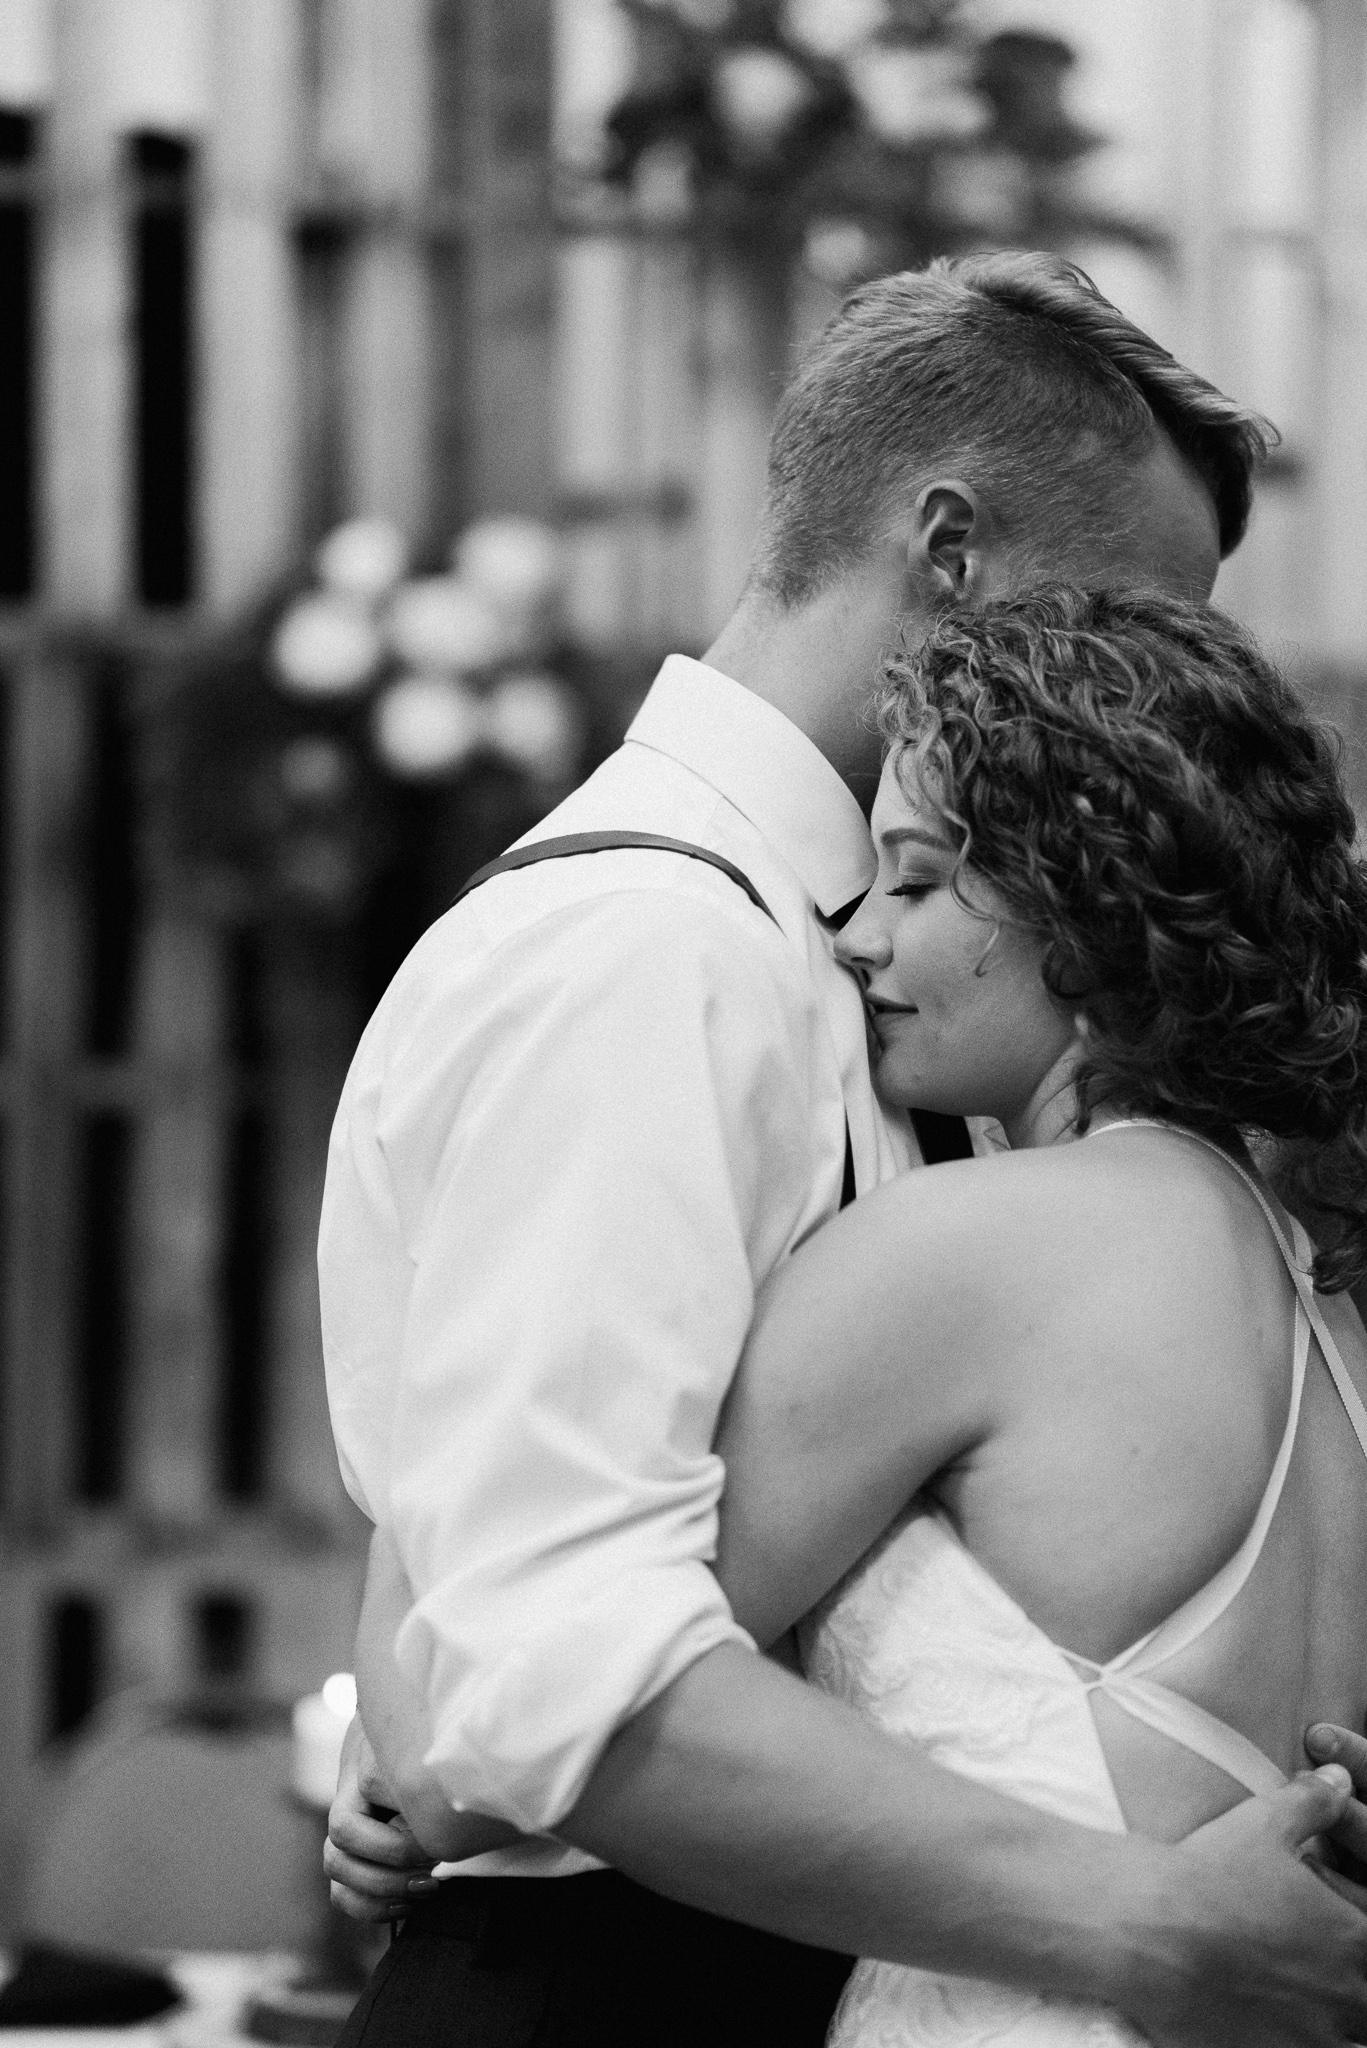 J&C-Weddingblog-155.jpg